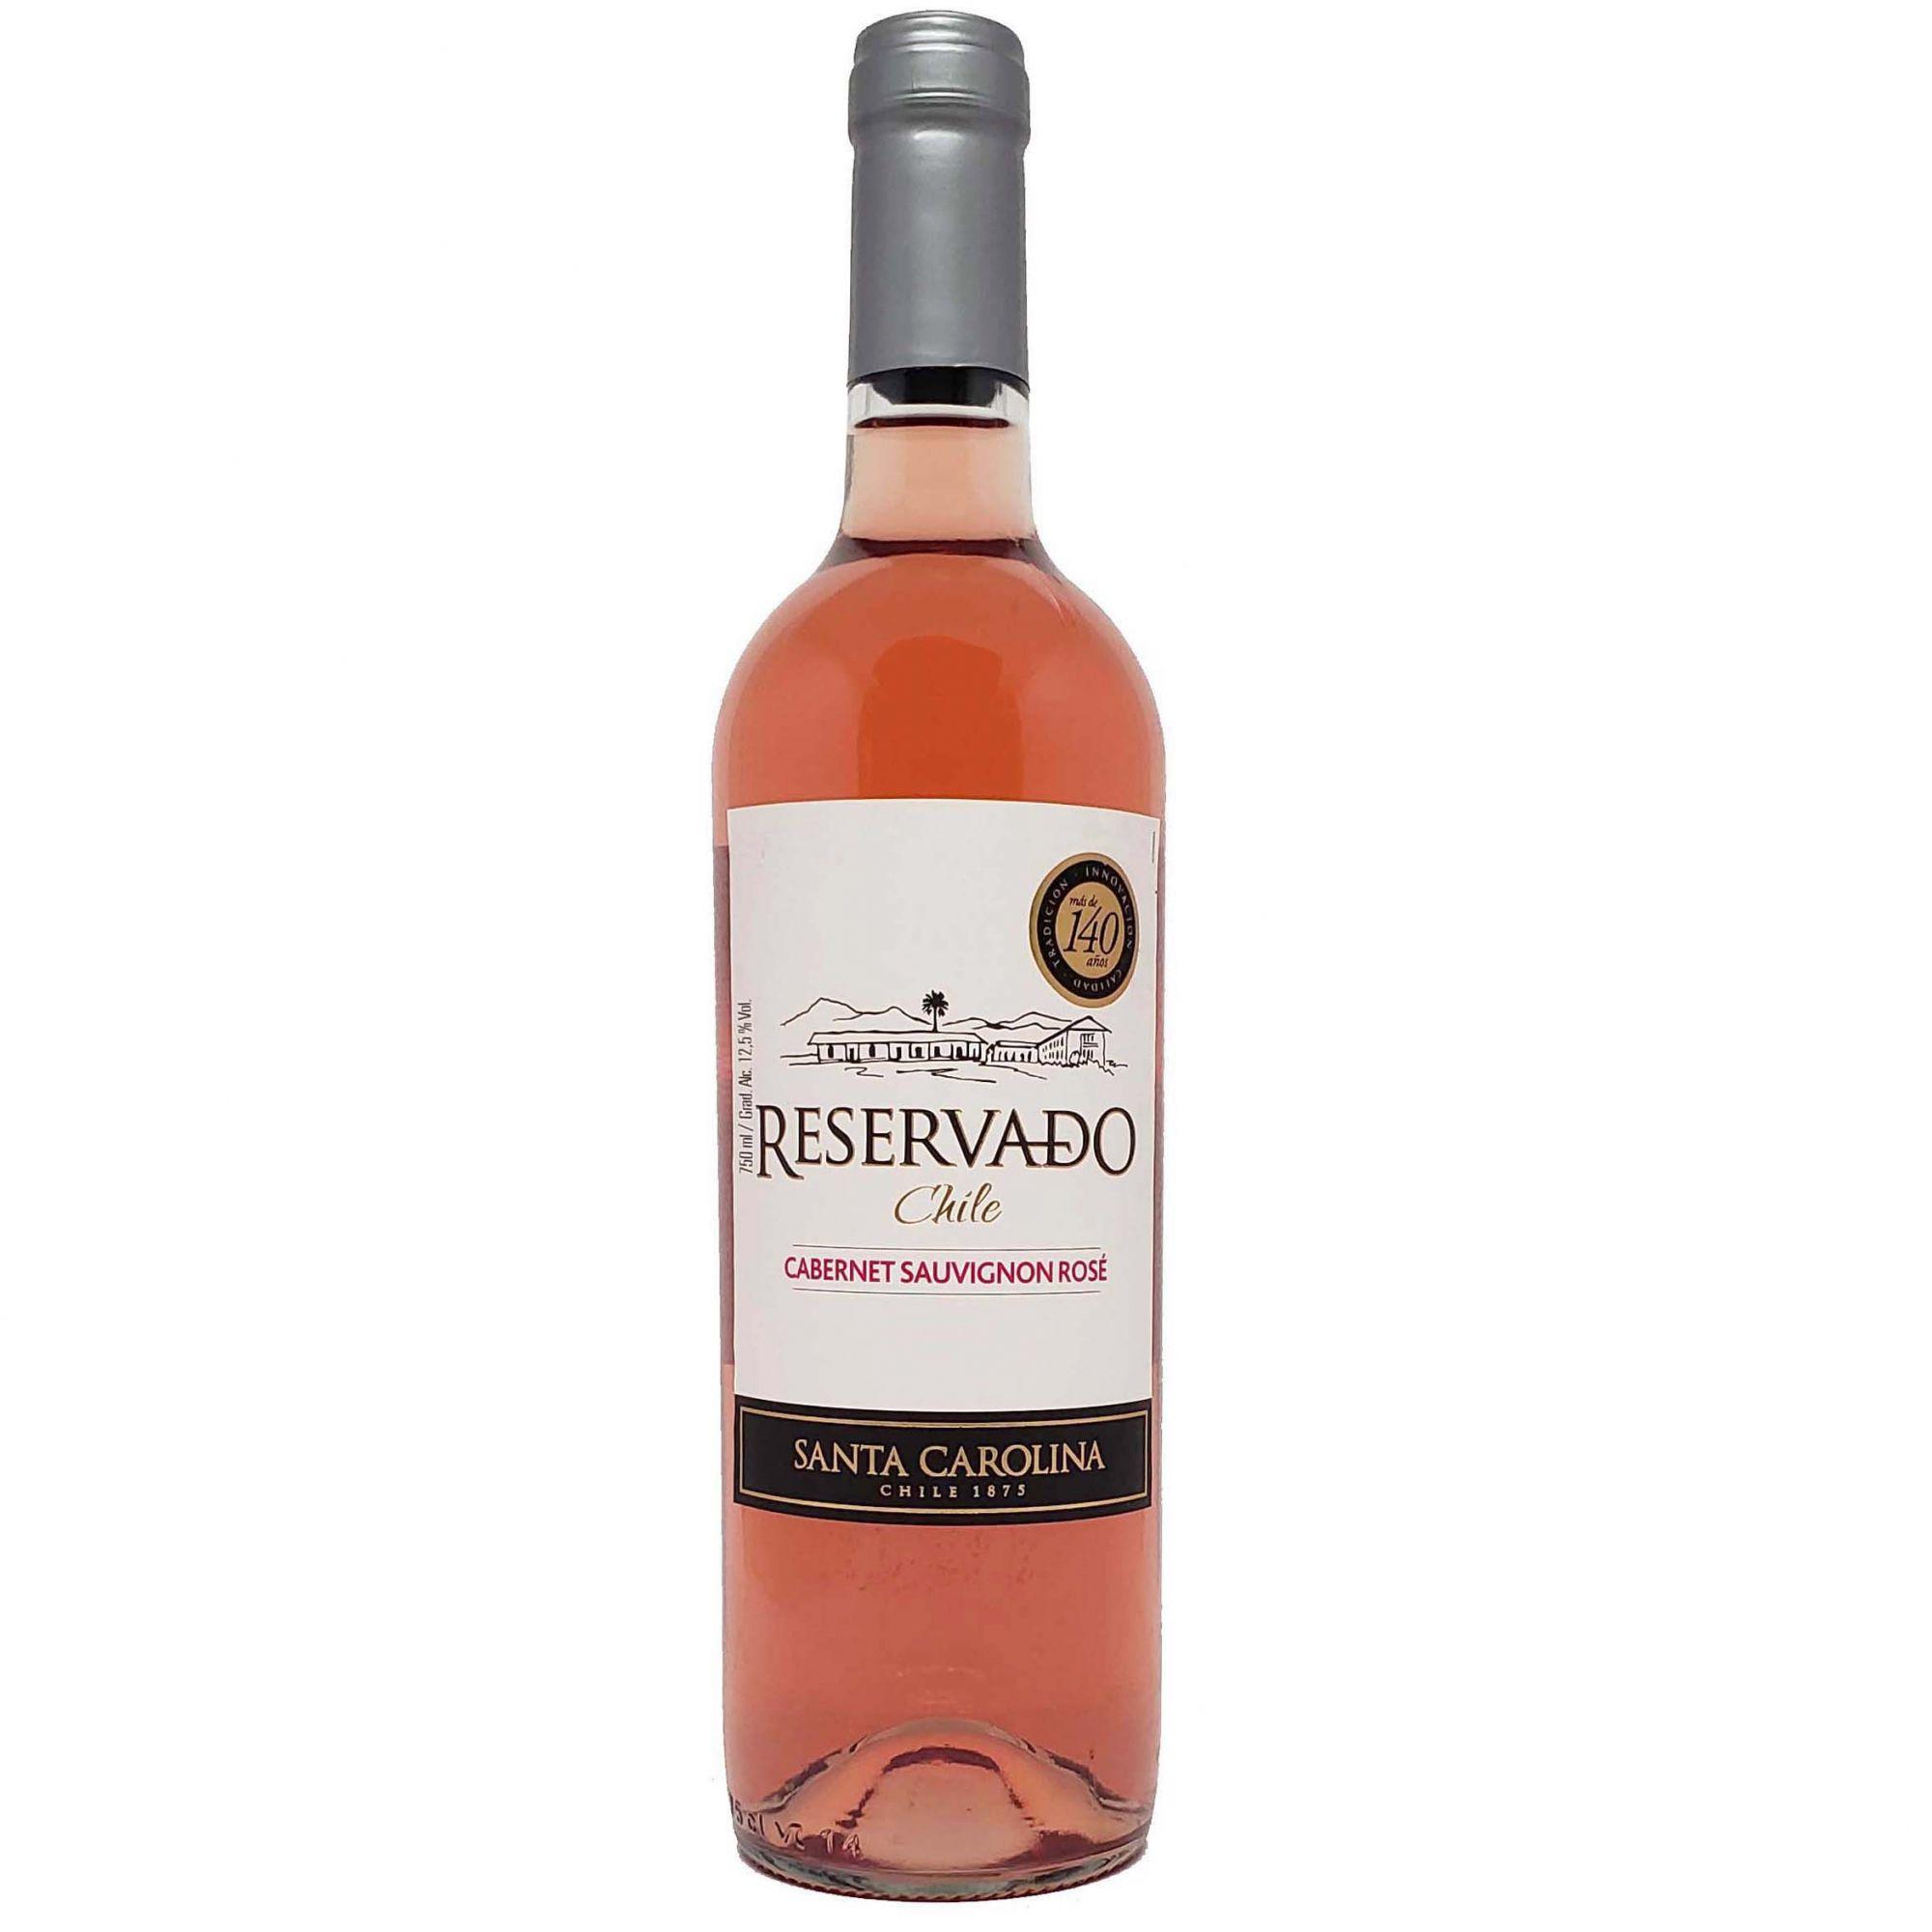 Vinho Rosé Reservado Santa Carolina - 750ml -